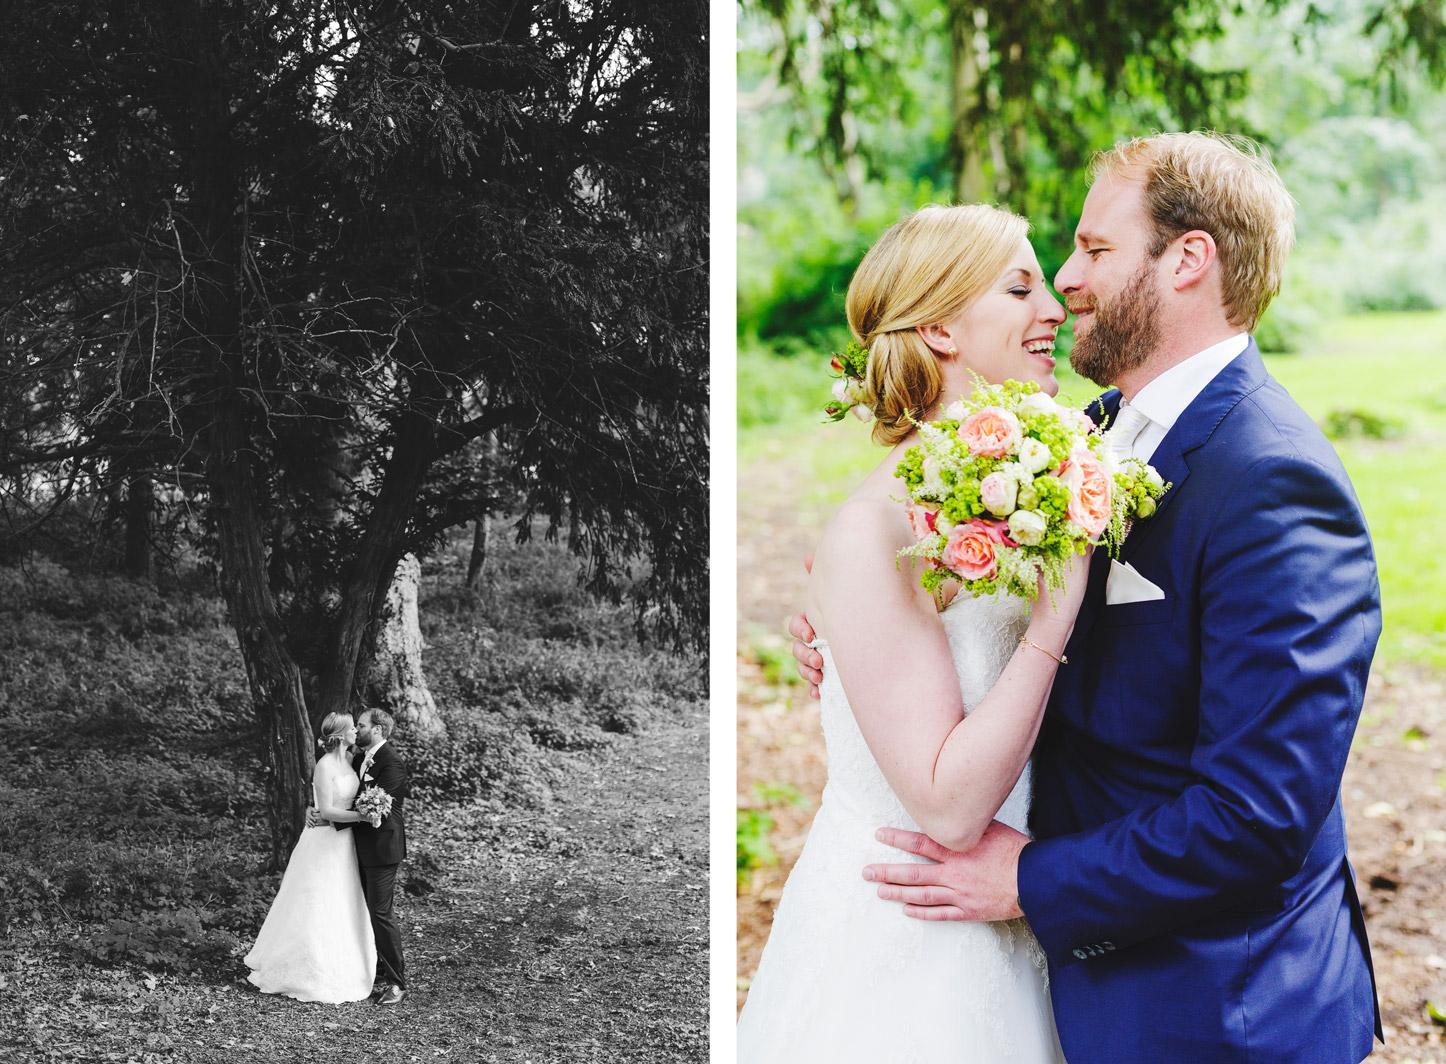 Brautpaarshooting auf Rittergut Orr